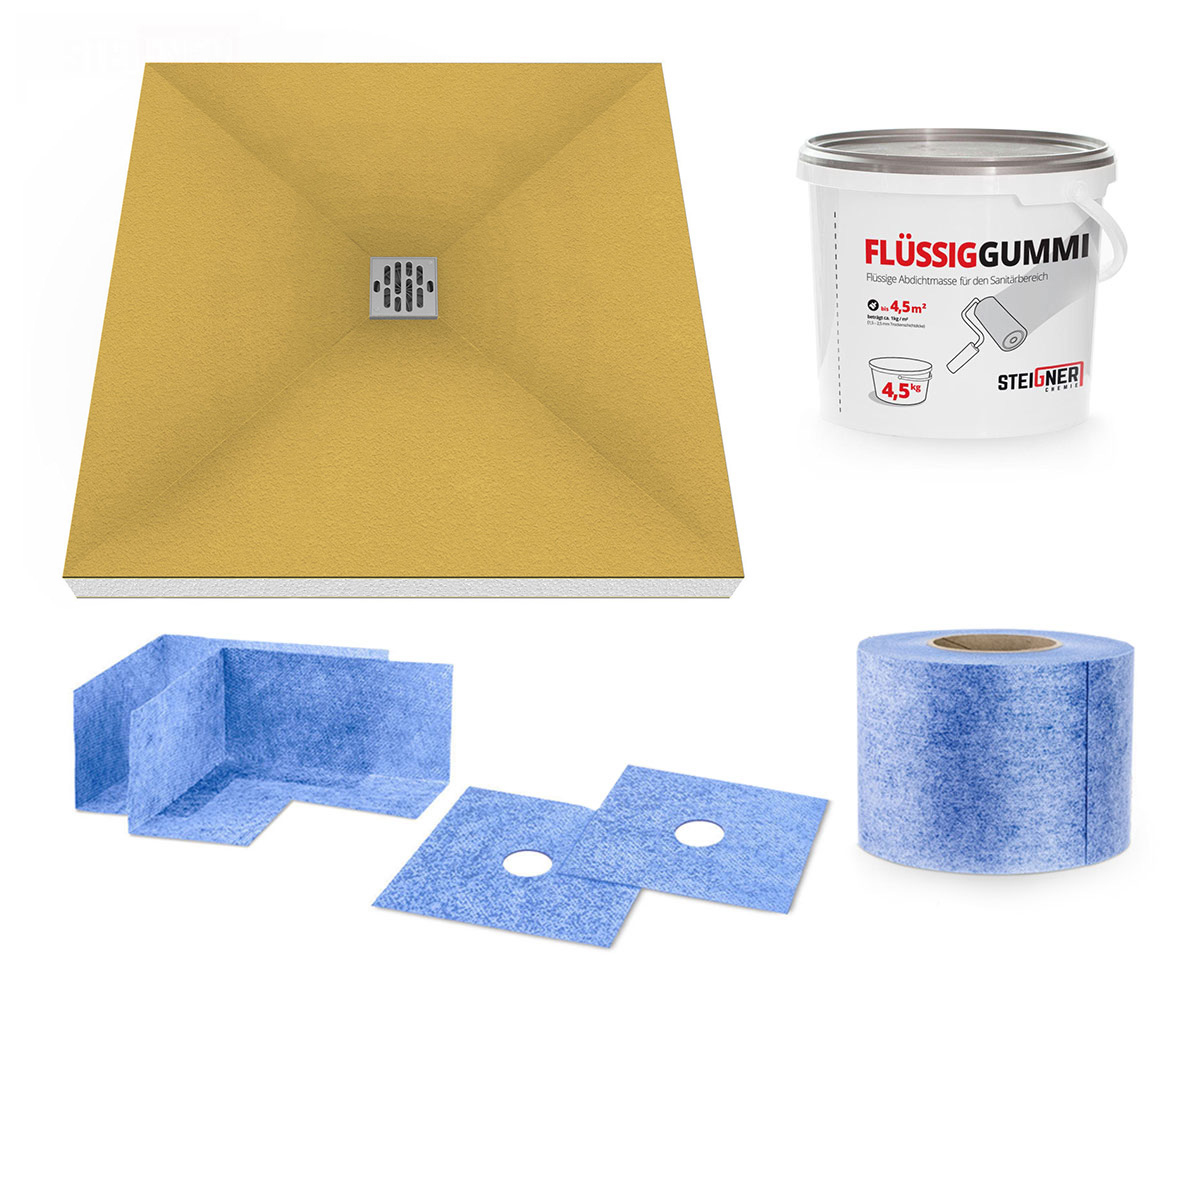 duschelement duschboard duschtasse duschwanne befliesbar bodeneben zuschneidbar ebay. Black Bedroom Furniture Sets. Home Design Ideas